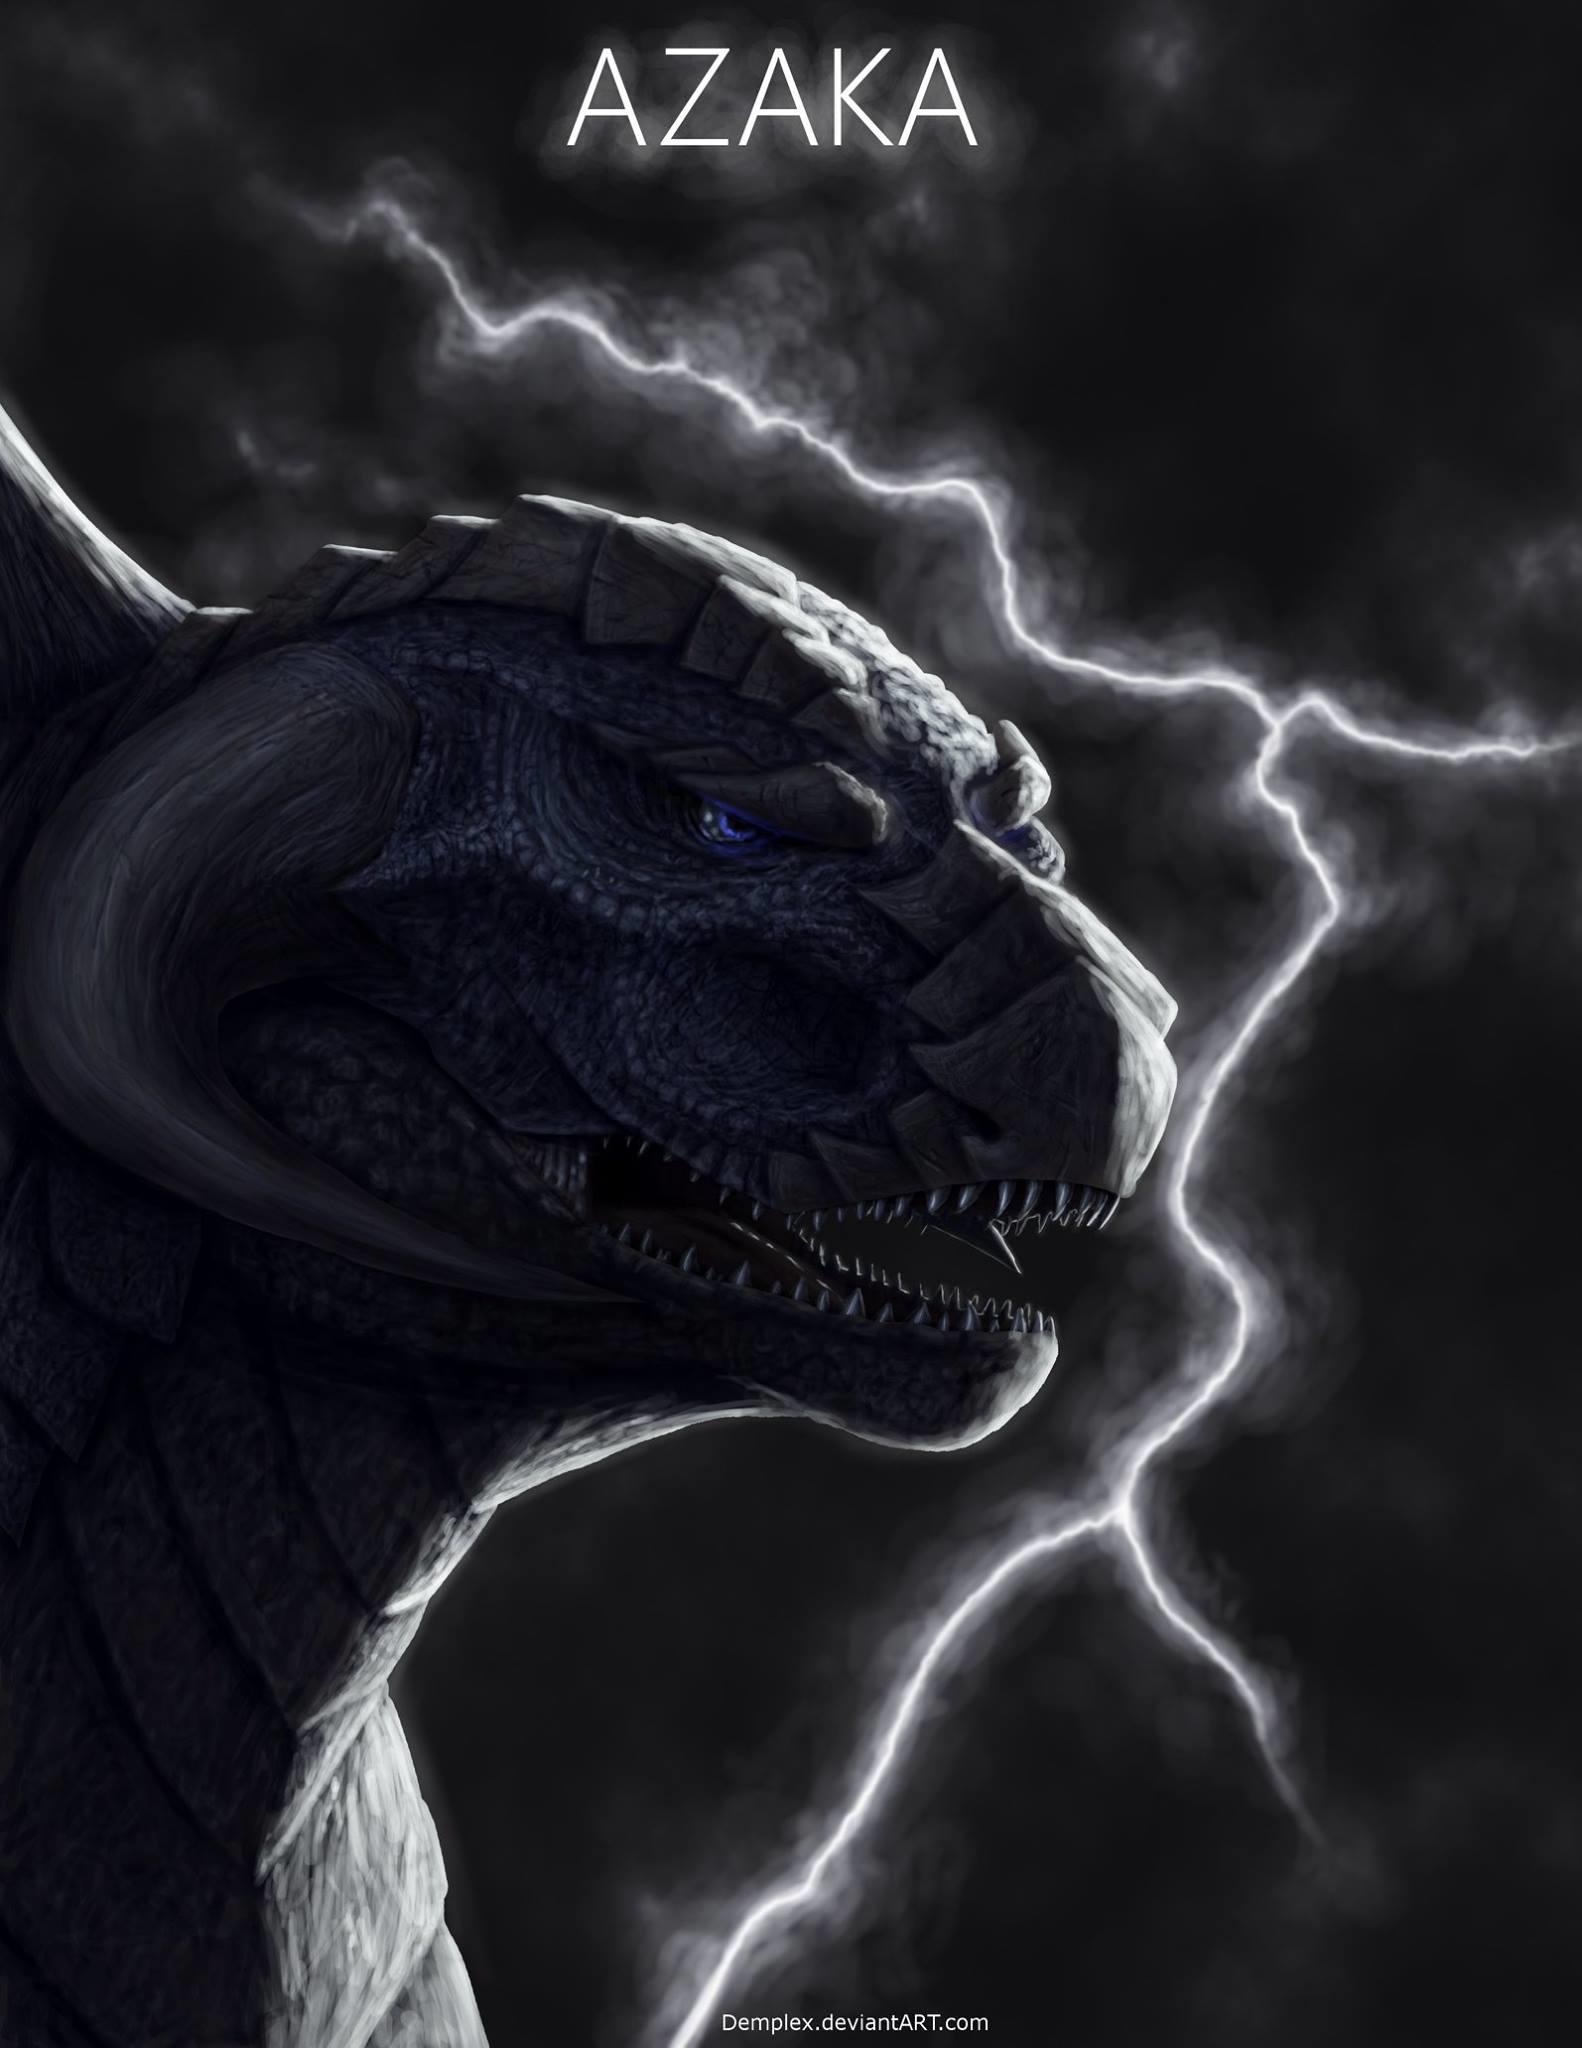 Azaka - The Lightning Kaiju